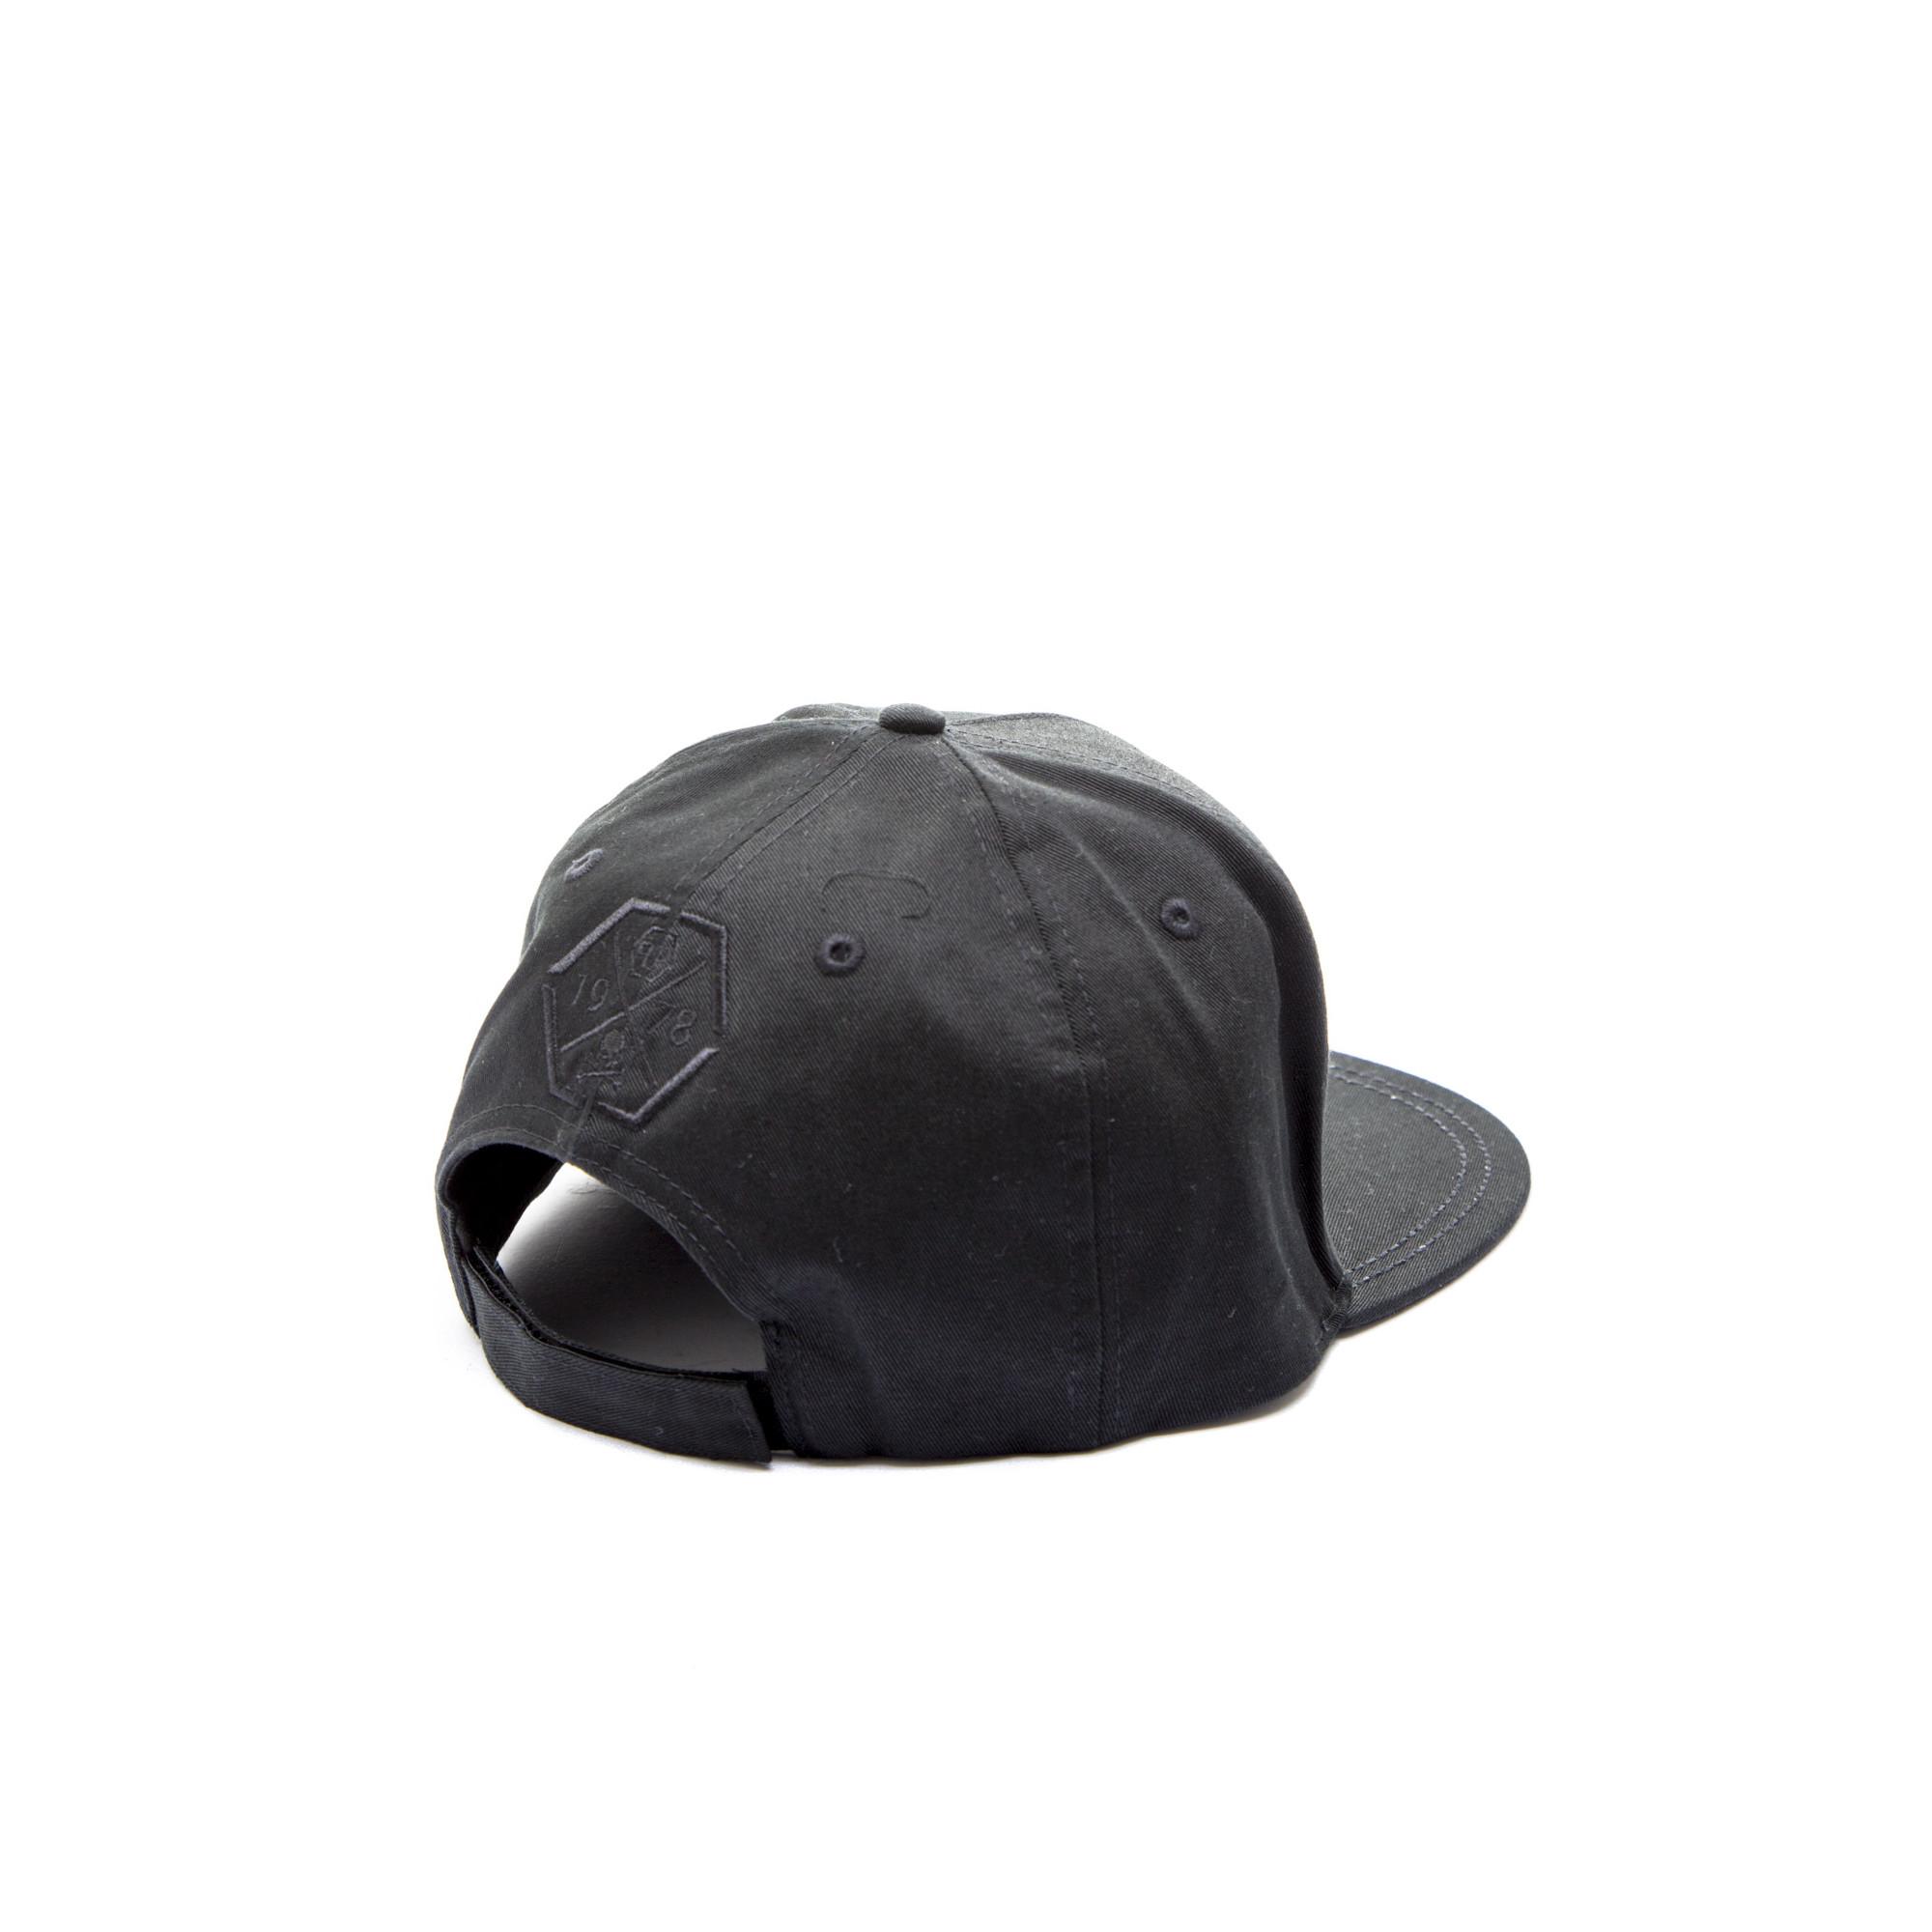 philipp plein baseball cap palm bay zwart. Black Bedroom Furniture Sets. Home Design Ideas